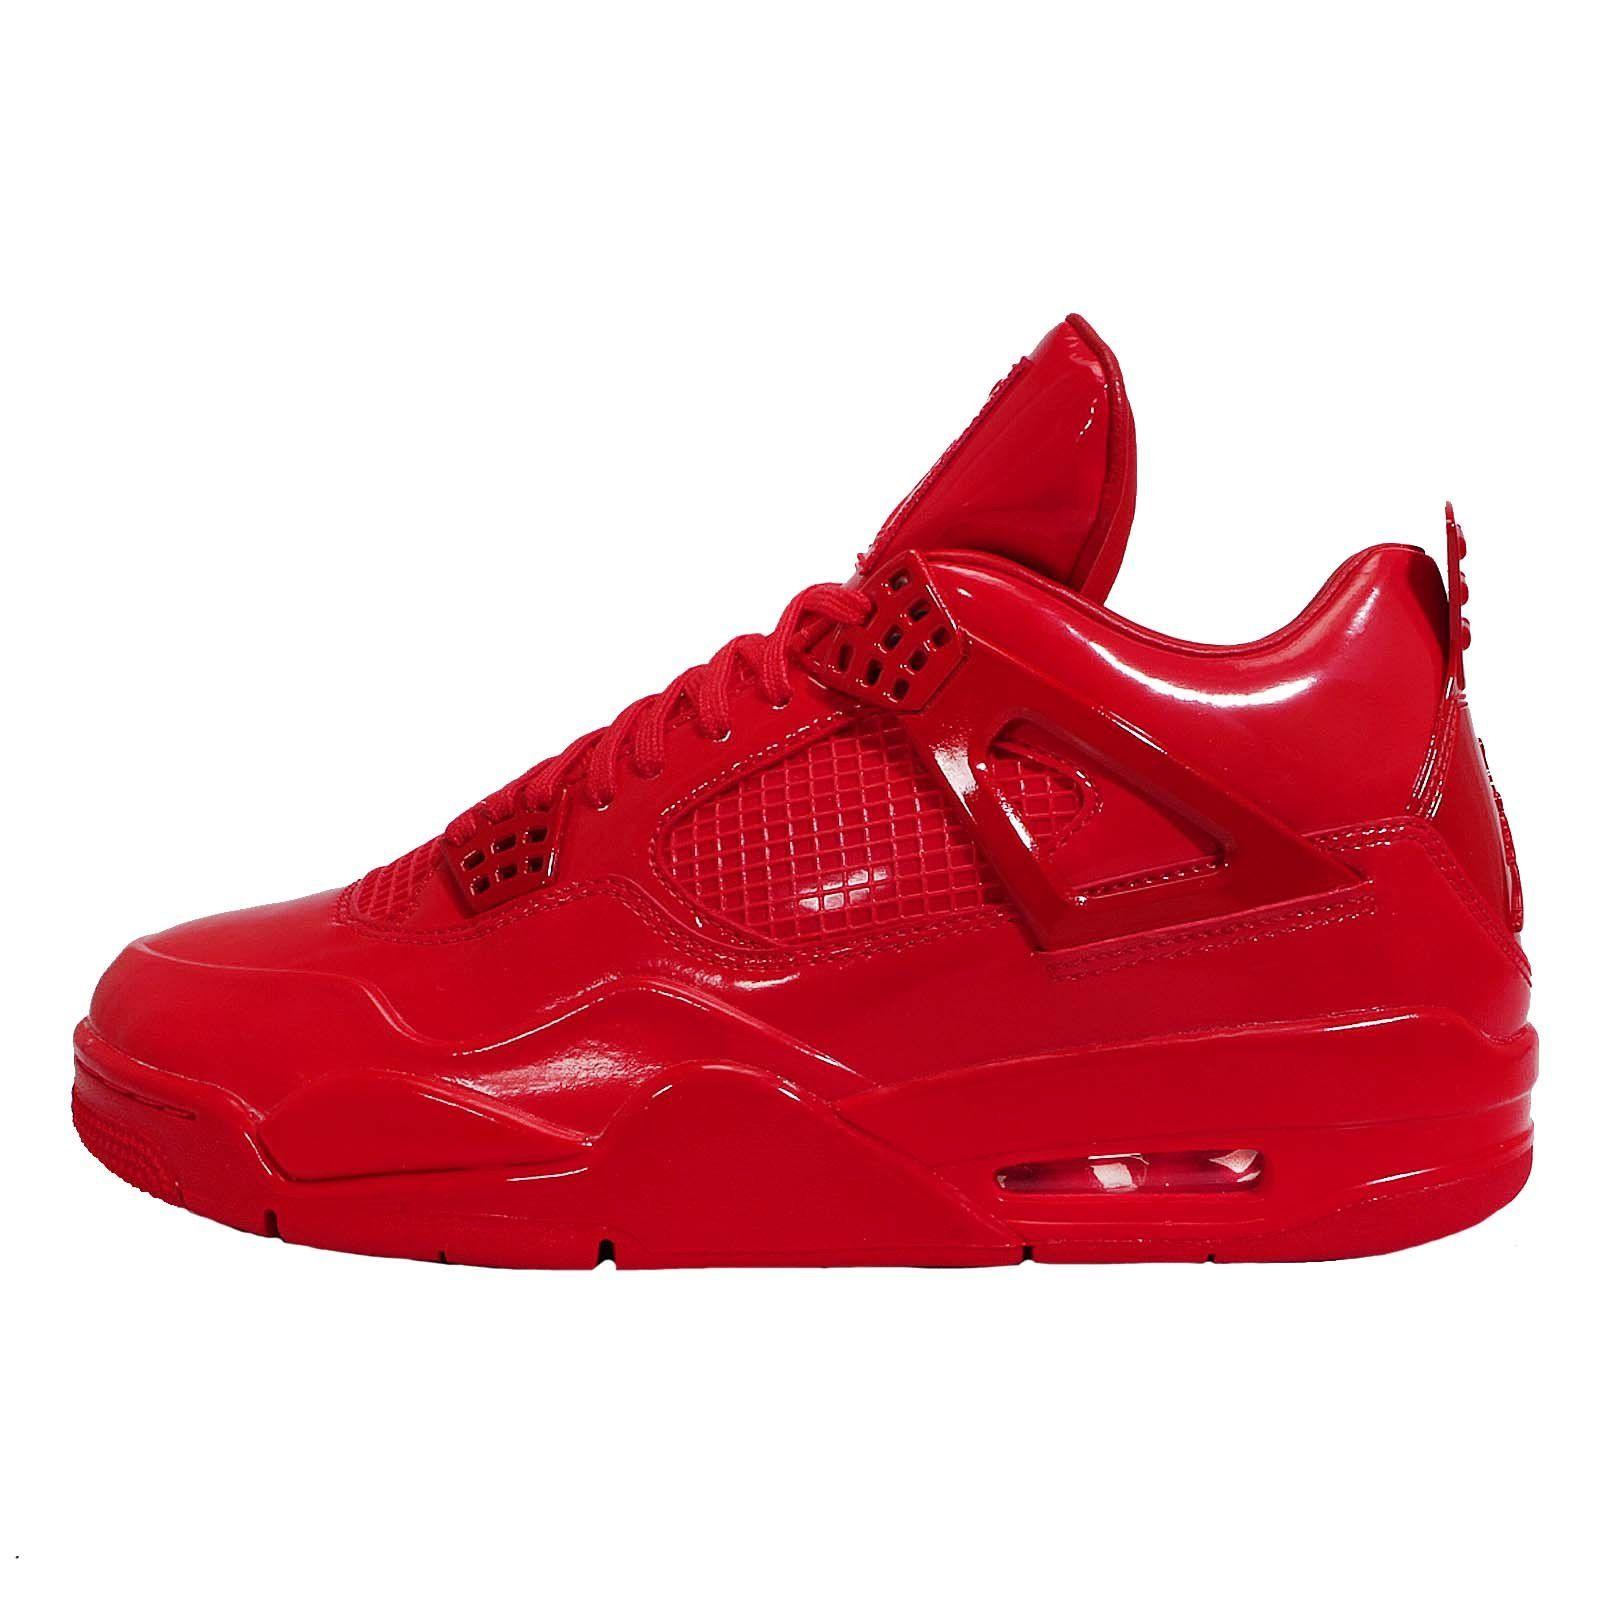 Nike Air Jordan 11LAB4 Rot Patent Sneaker 719864 600 Size 44